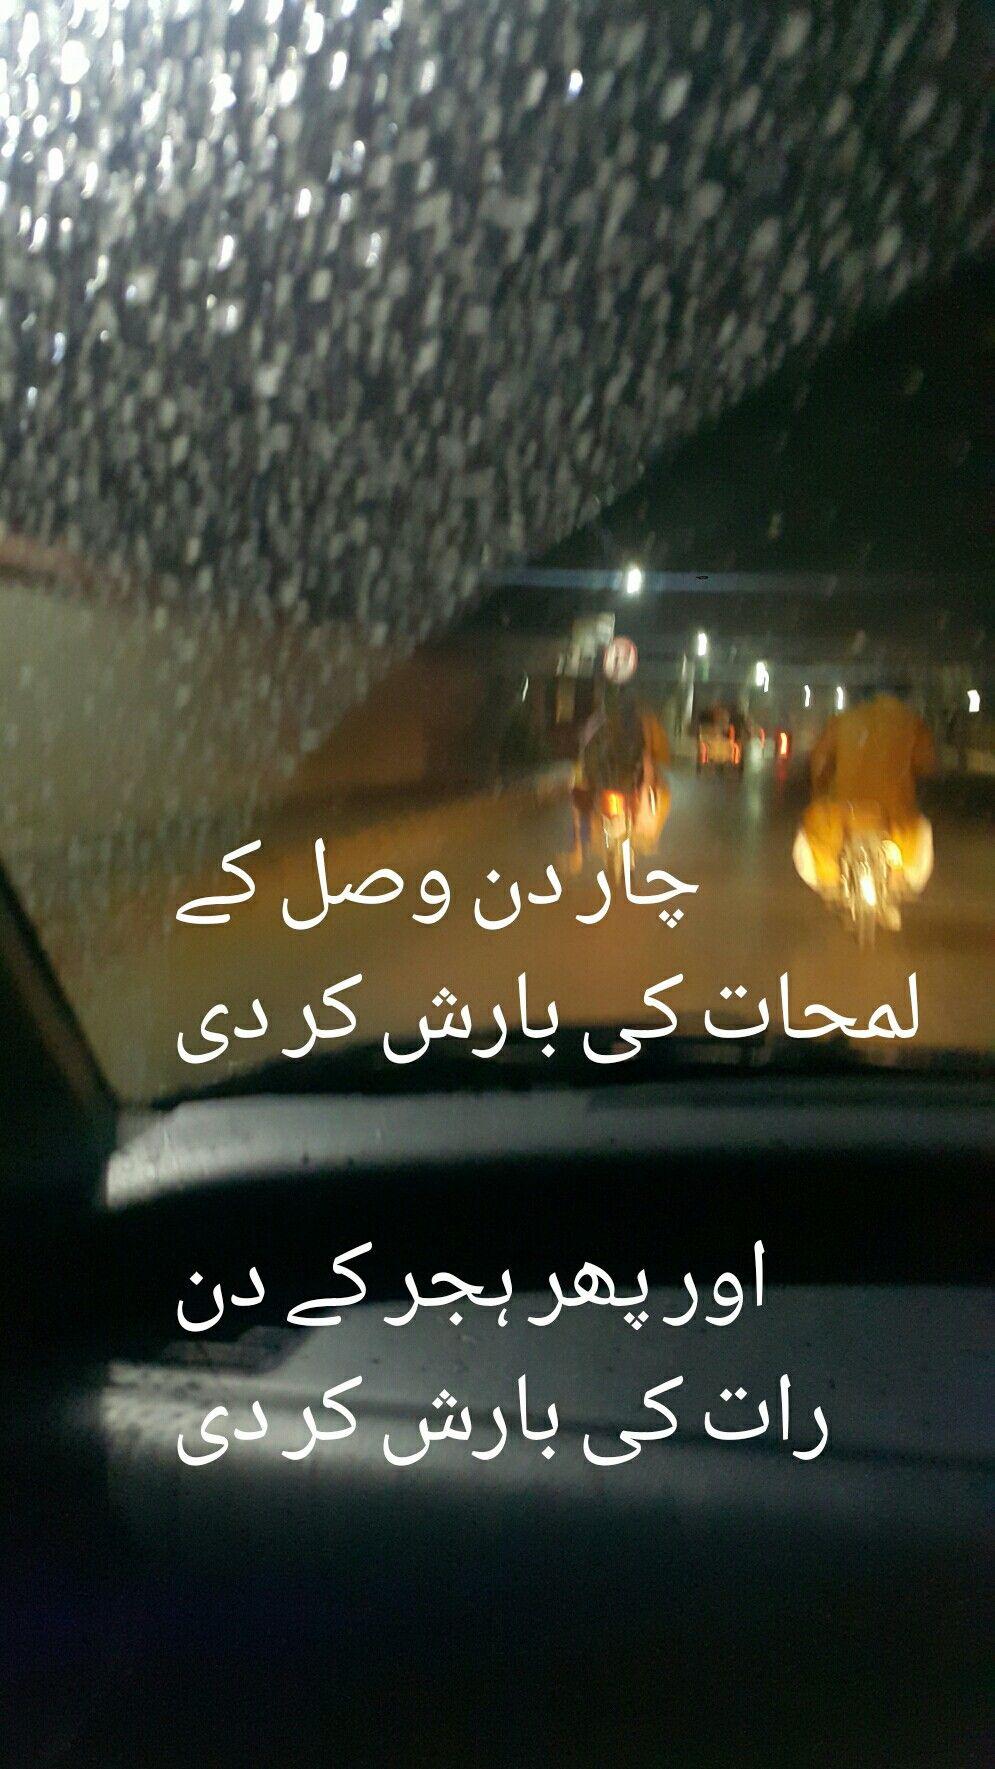 Pin By Mansoor Abro On بارش Rain Rain Quotes Barish Poetry Best Urdu Poetry Images